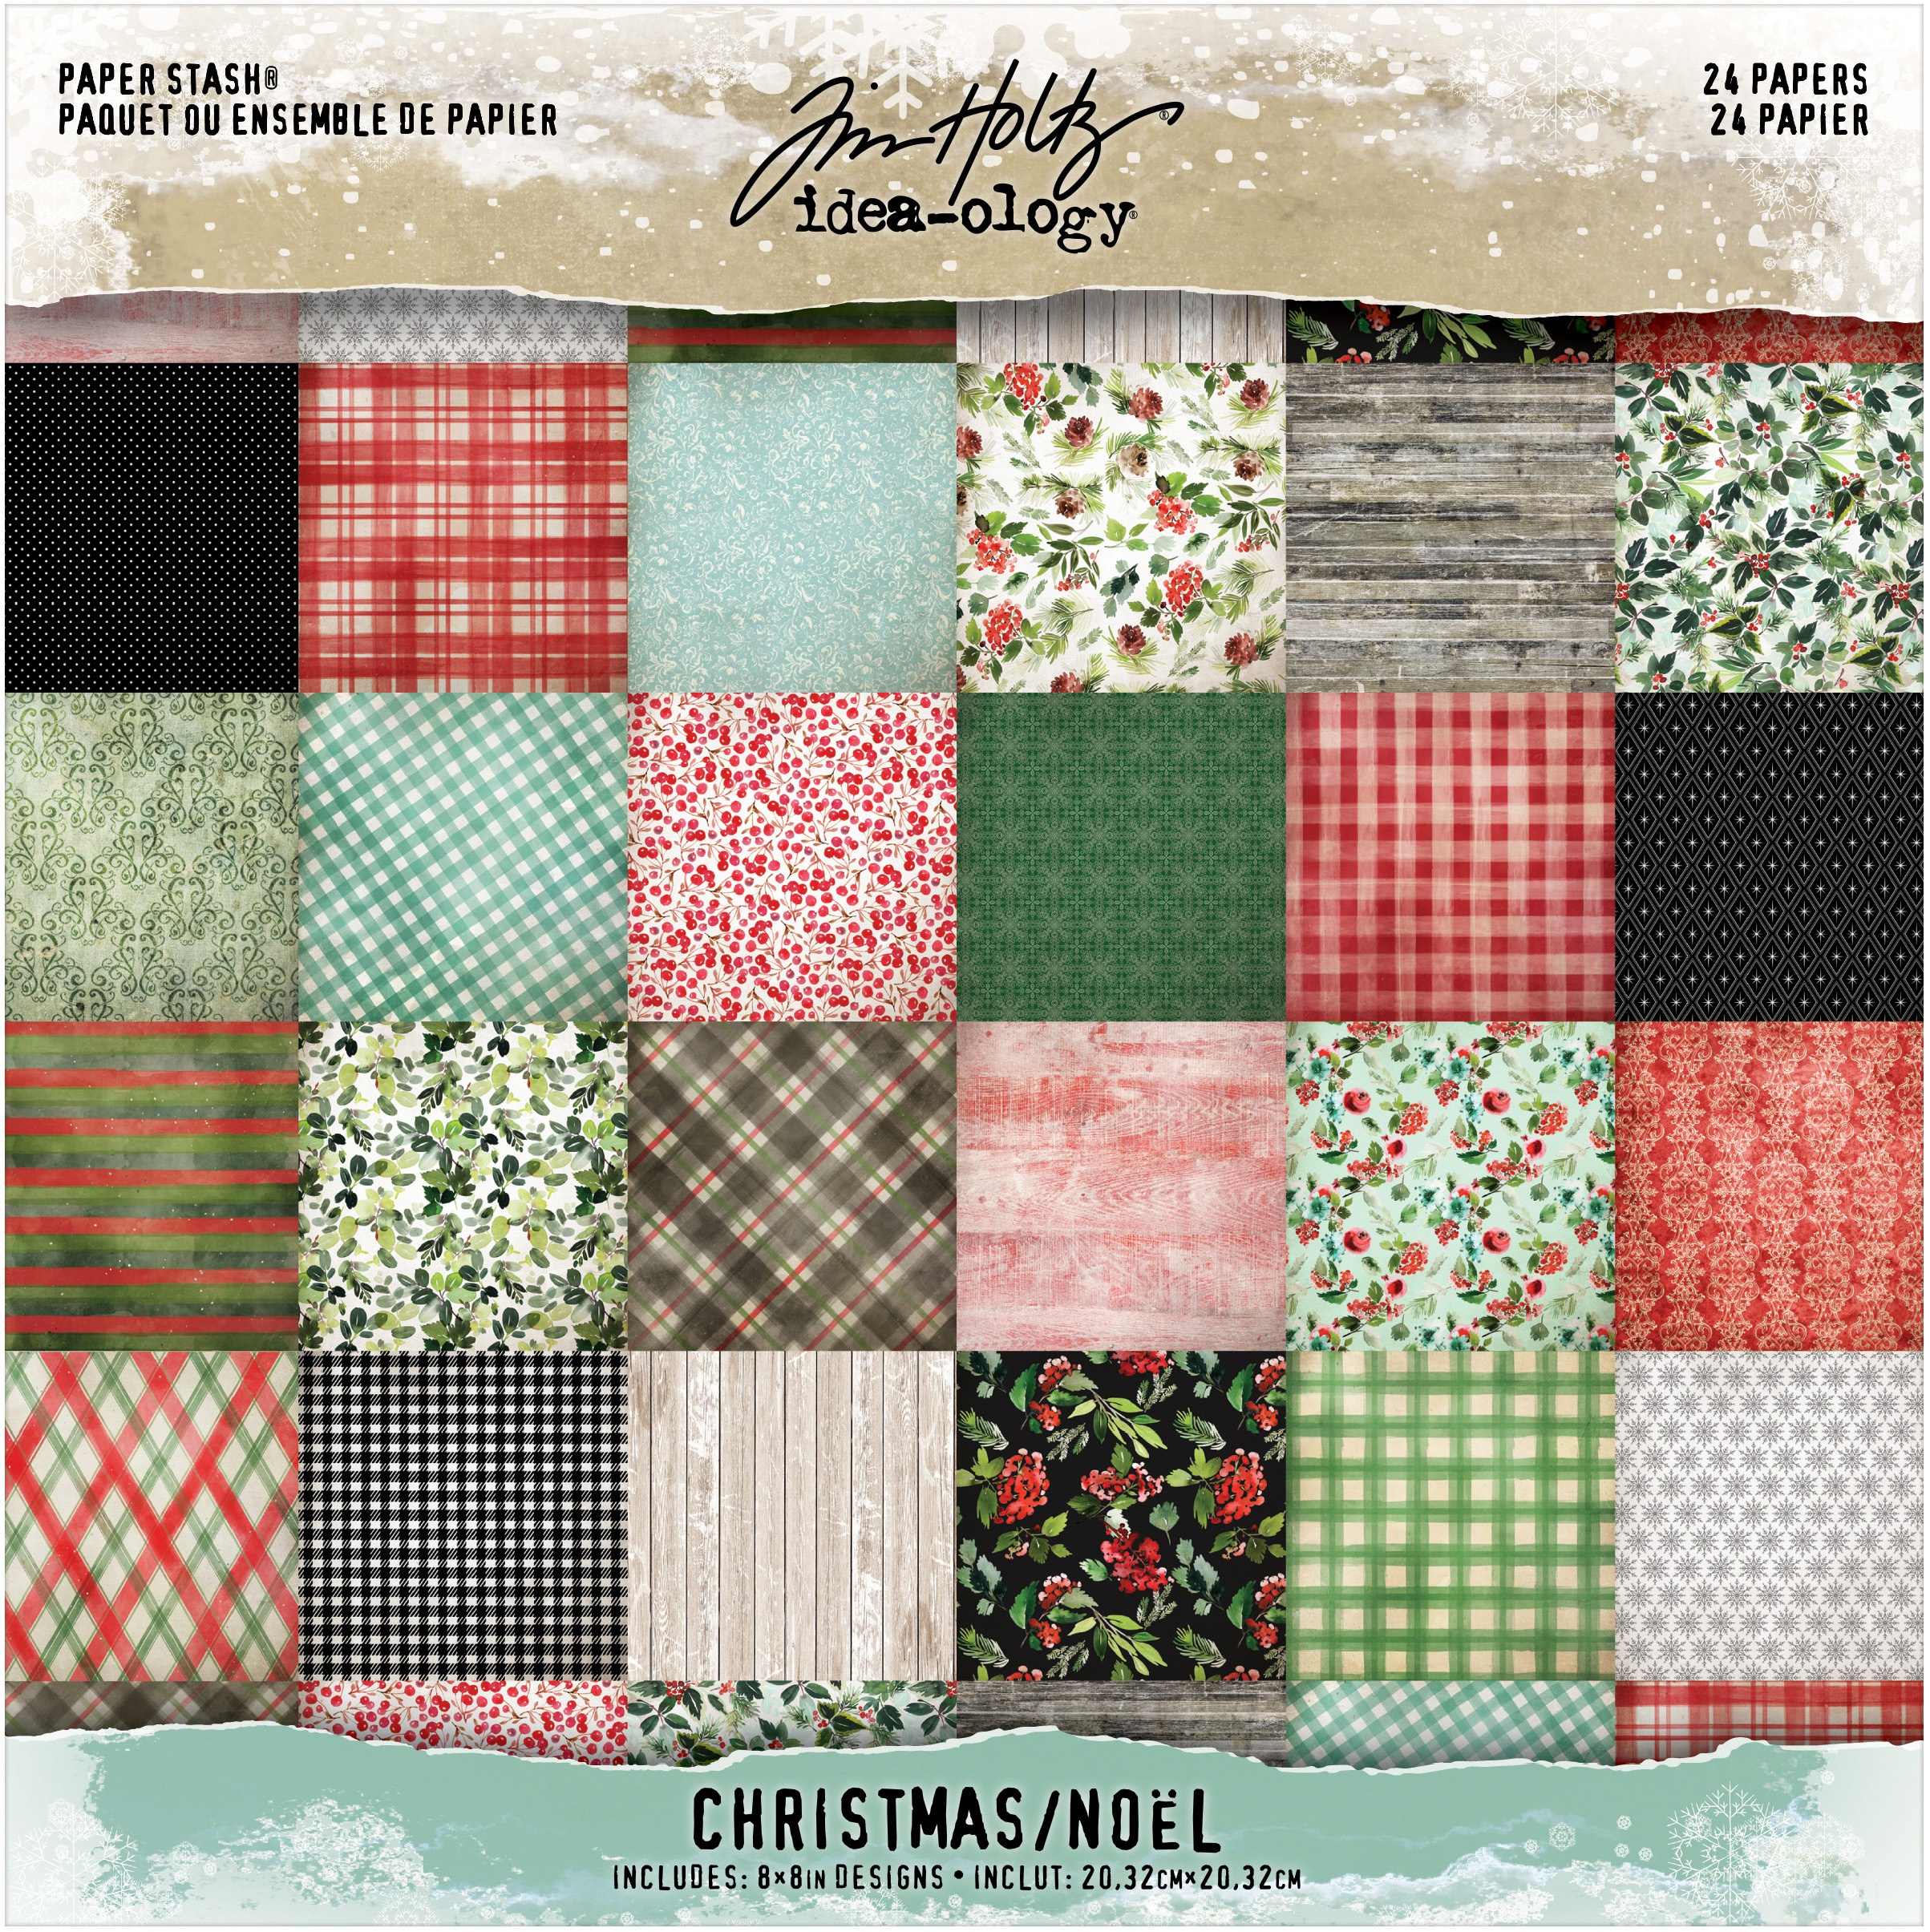 Idea-Ology Paper Stash Double-Sided Paper Pad 8X8 24/Pkg-Christmas, 12 Designs/2 Each